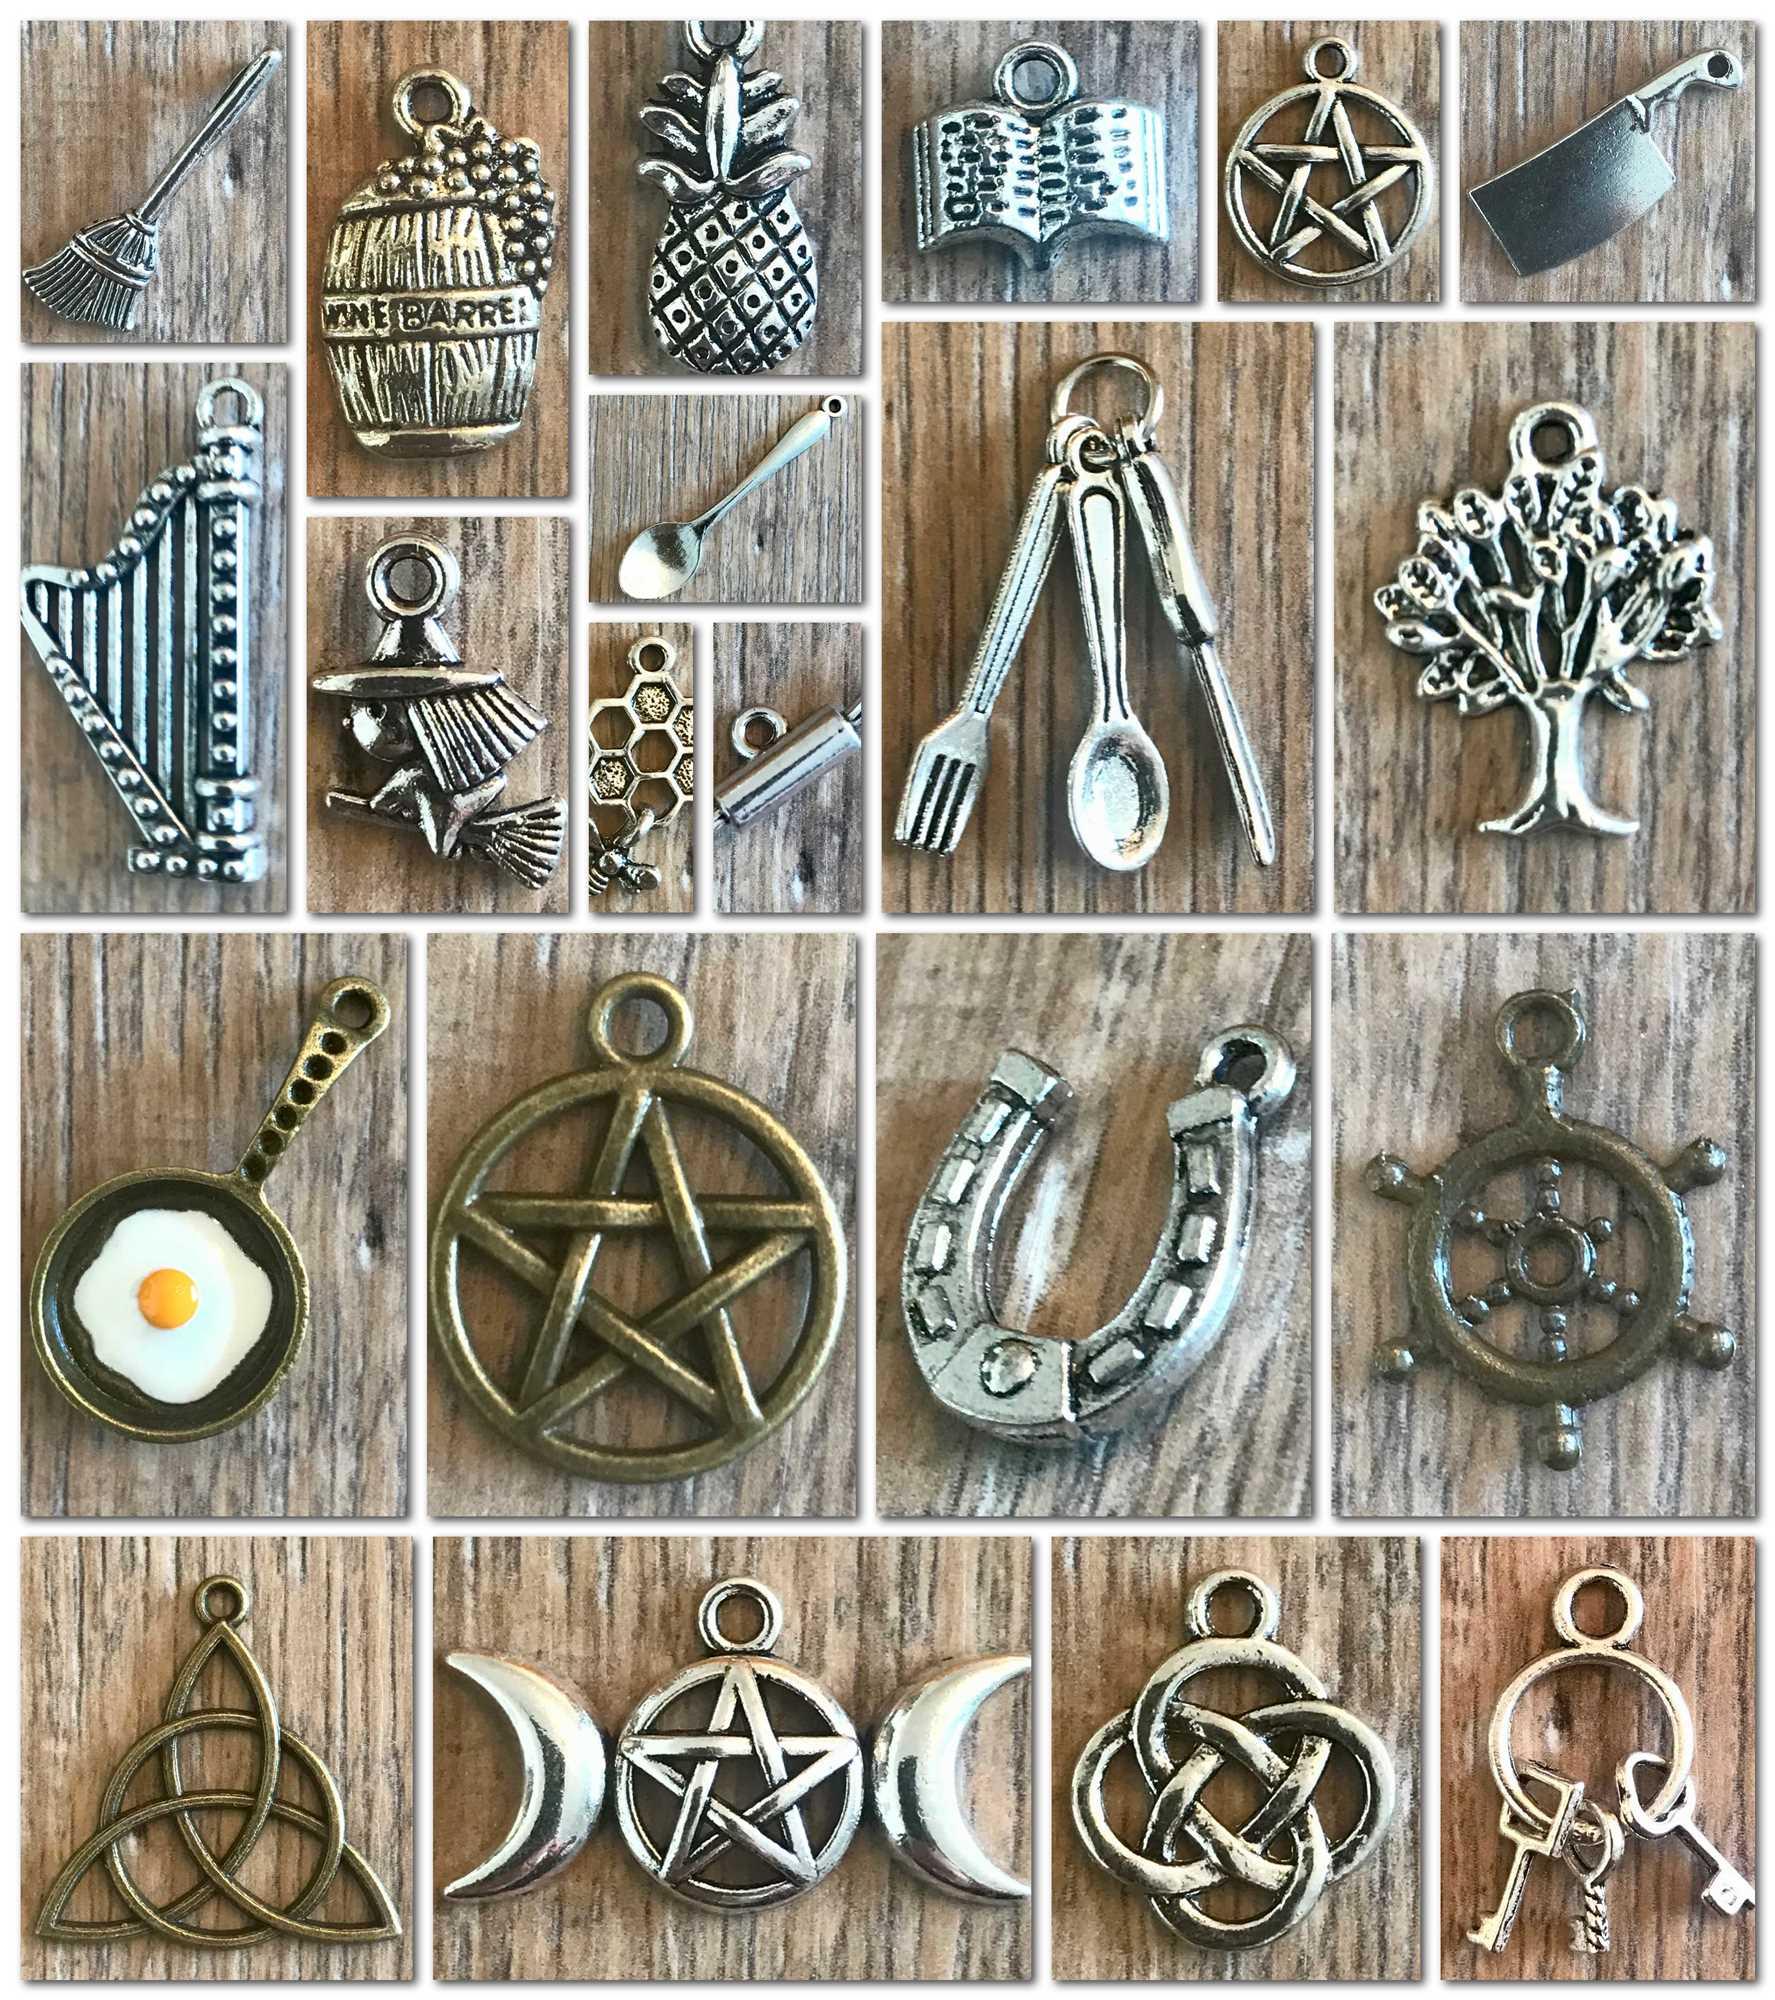 Amulette - Charms